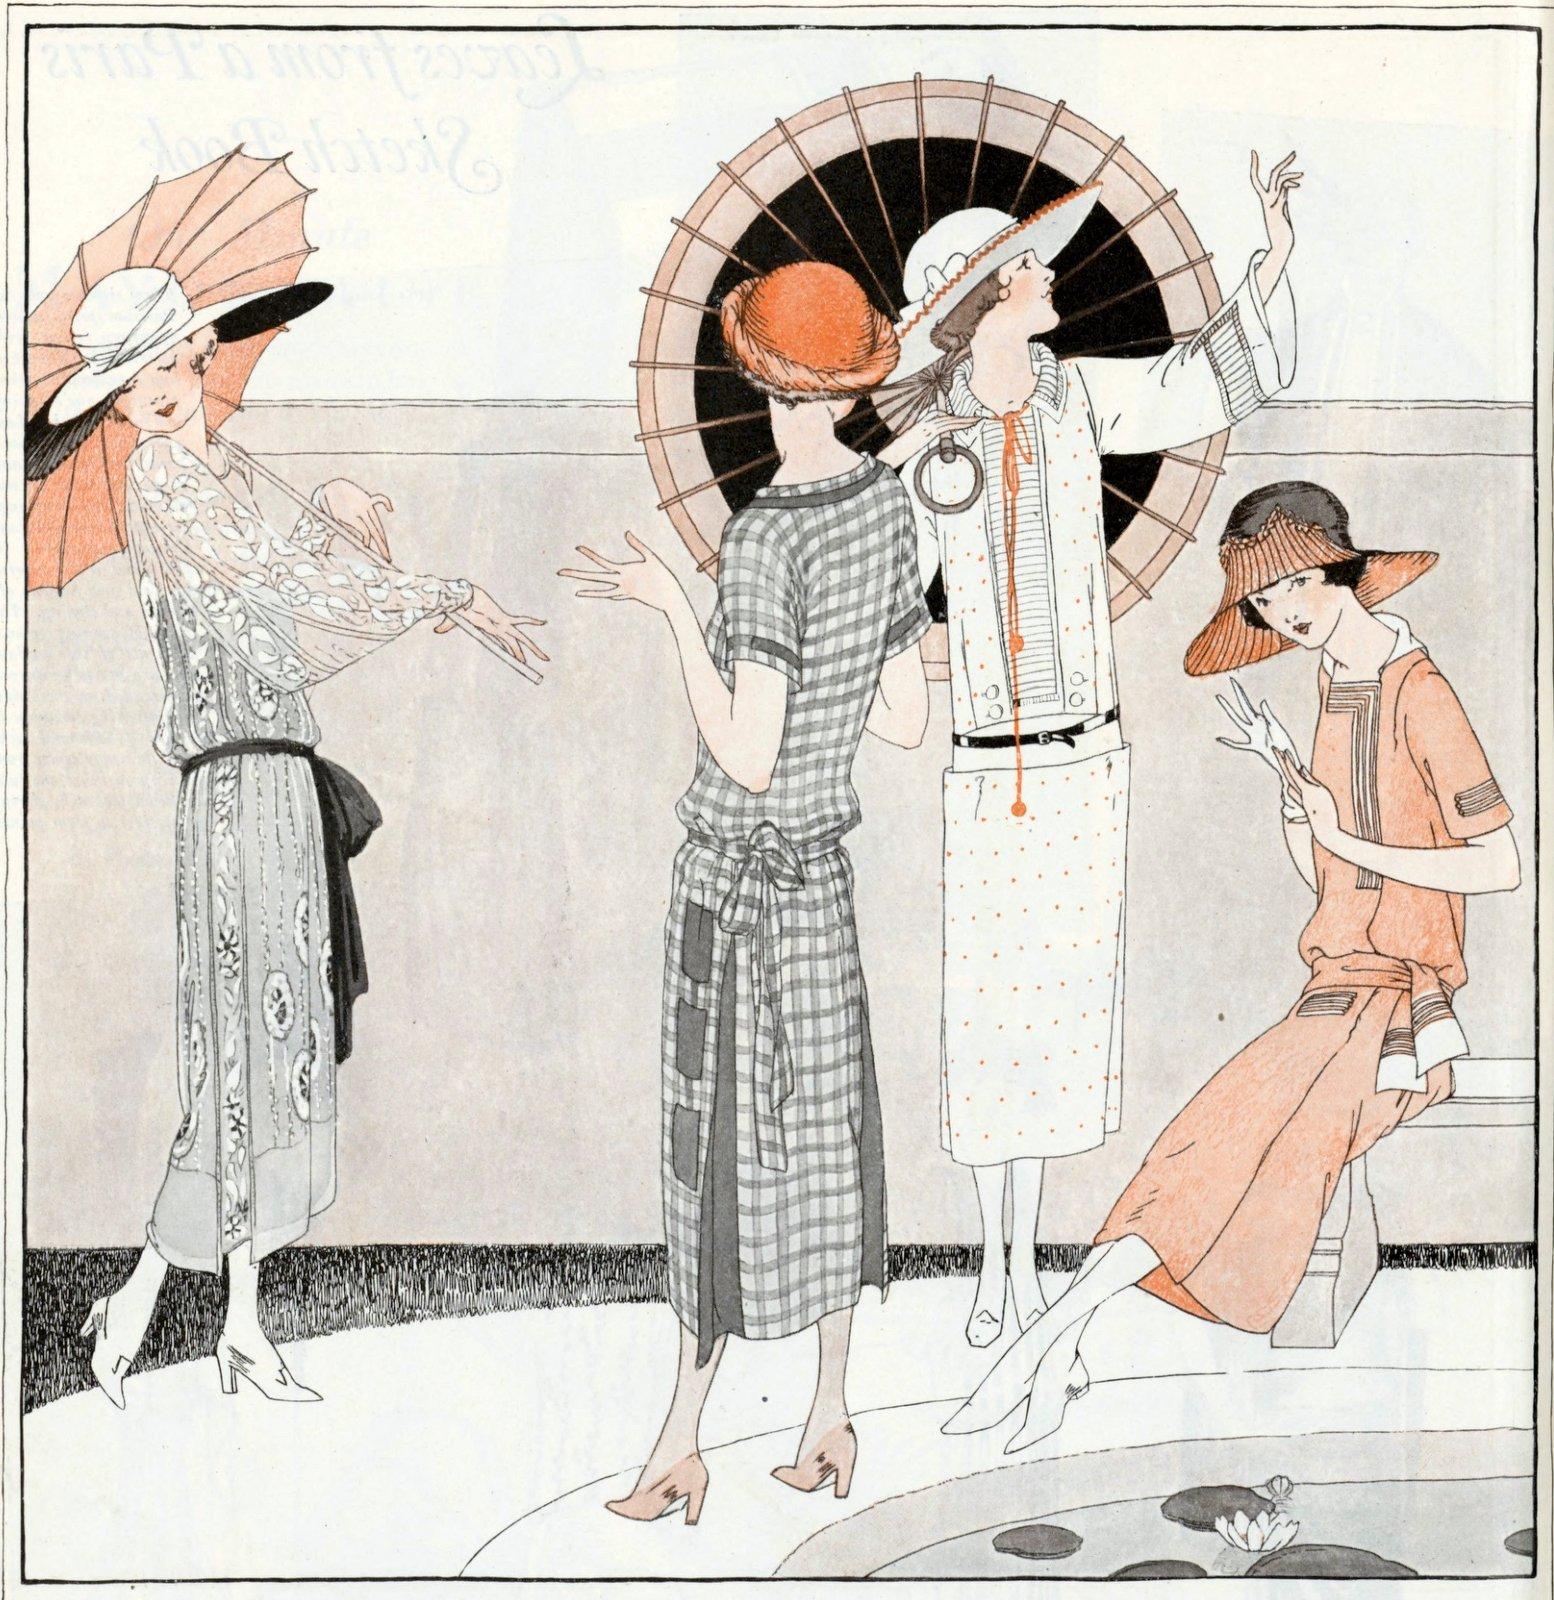 Stylish women in 1922